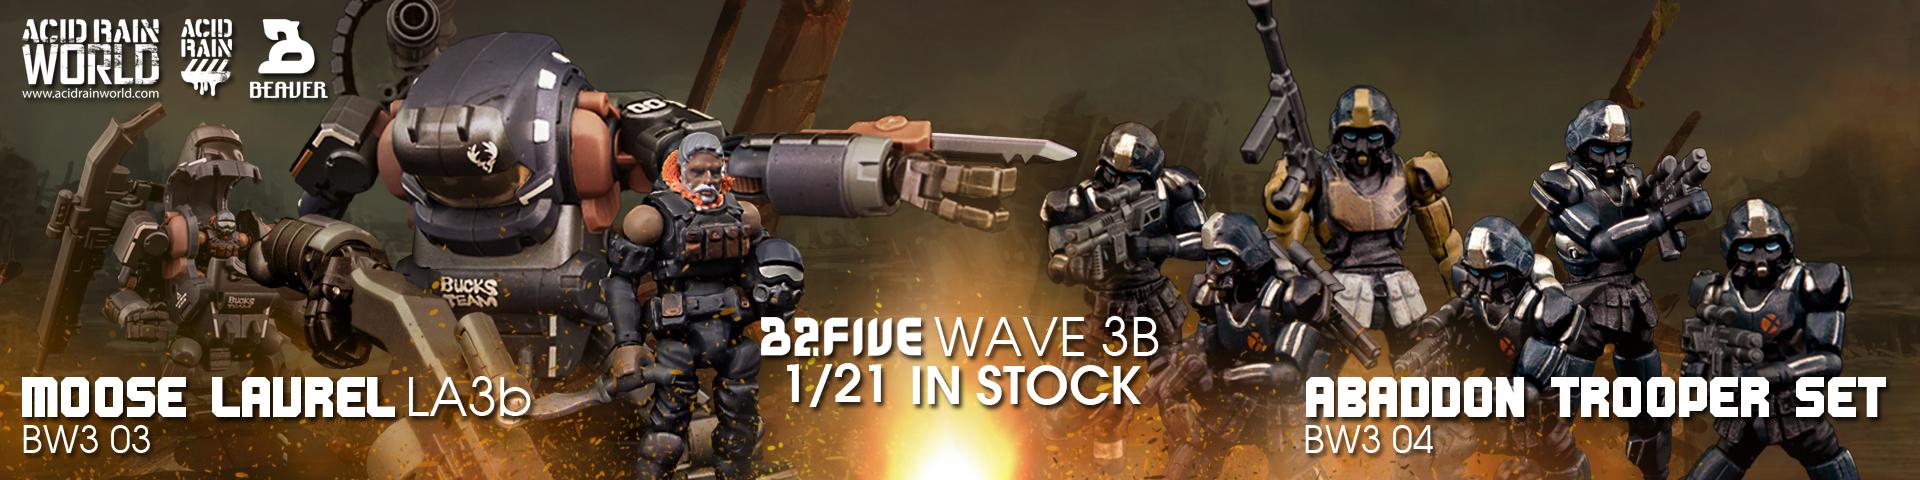 wave3B-121-instock-banner